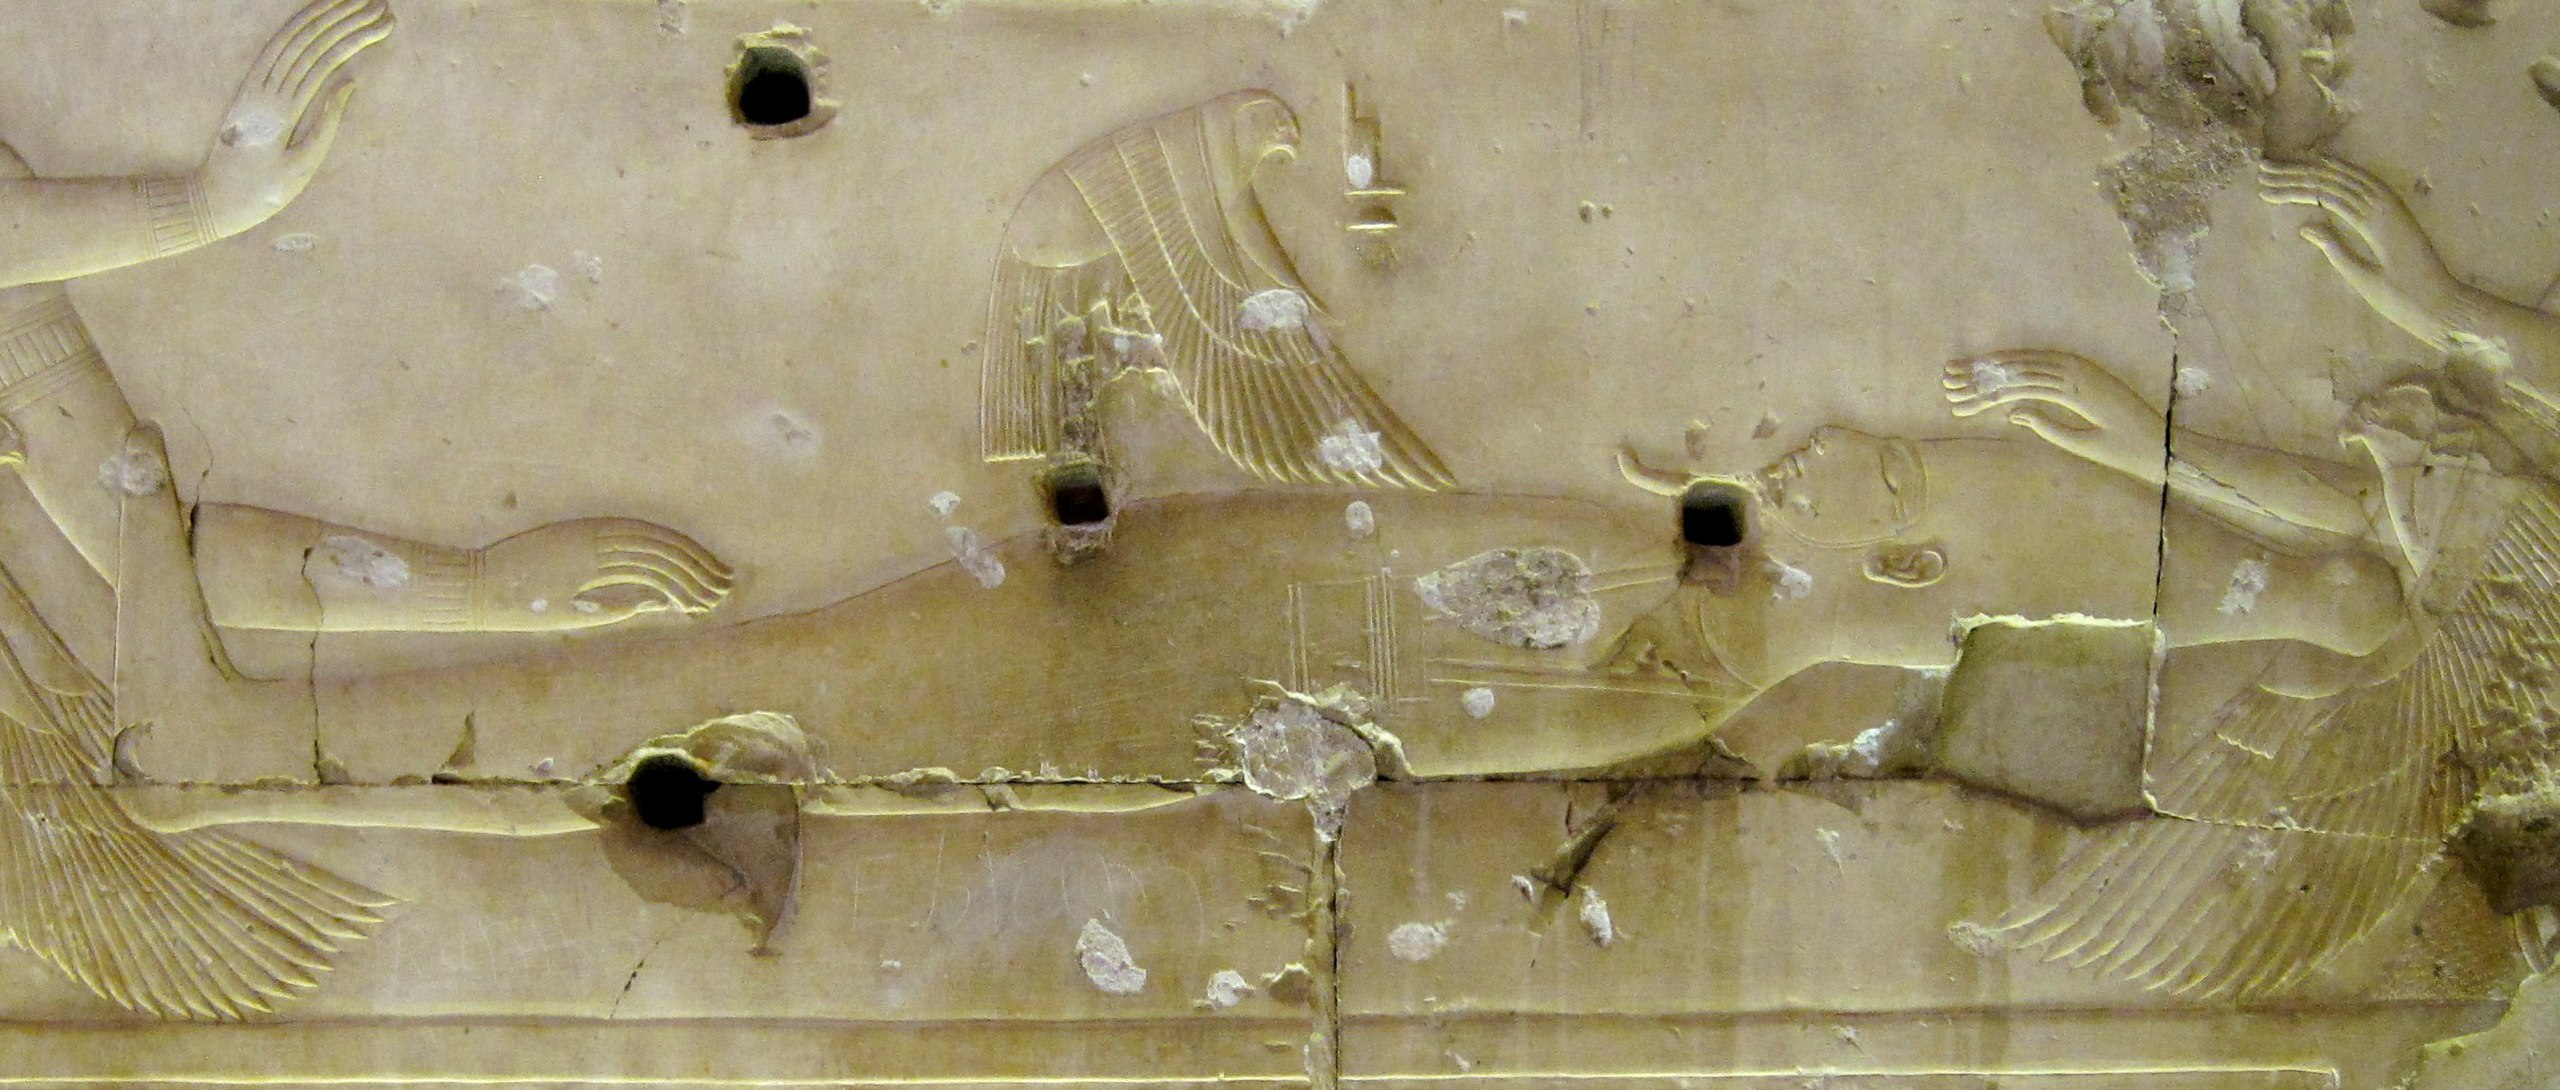 Isis, Osiris, Kali, Shiva - 973-Eht-Namuh-973 com The Oracle Forum